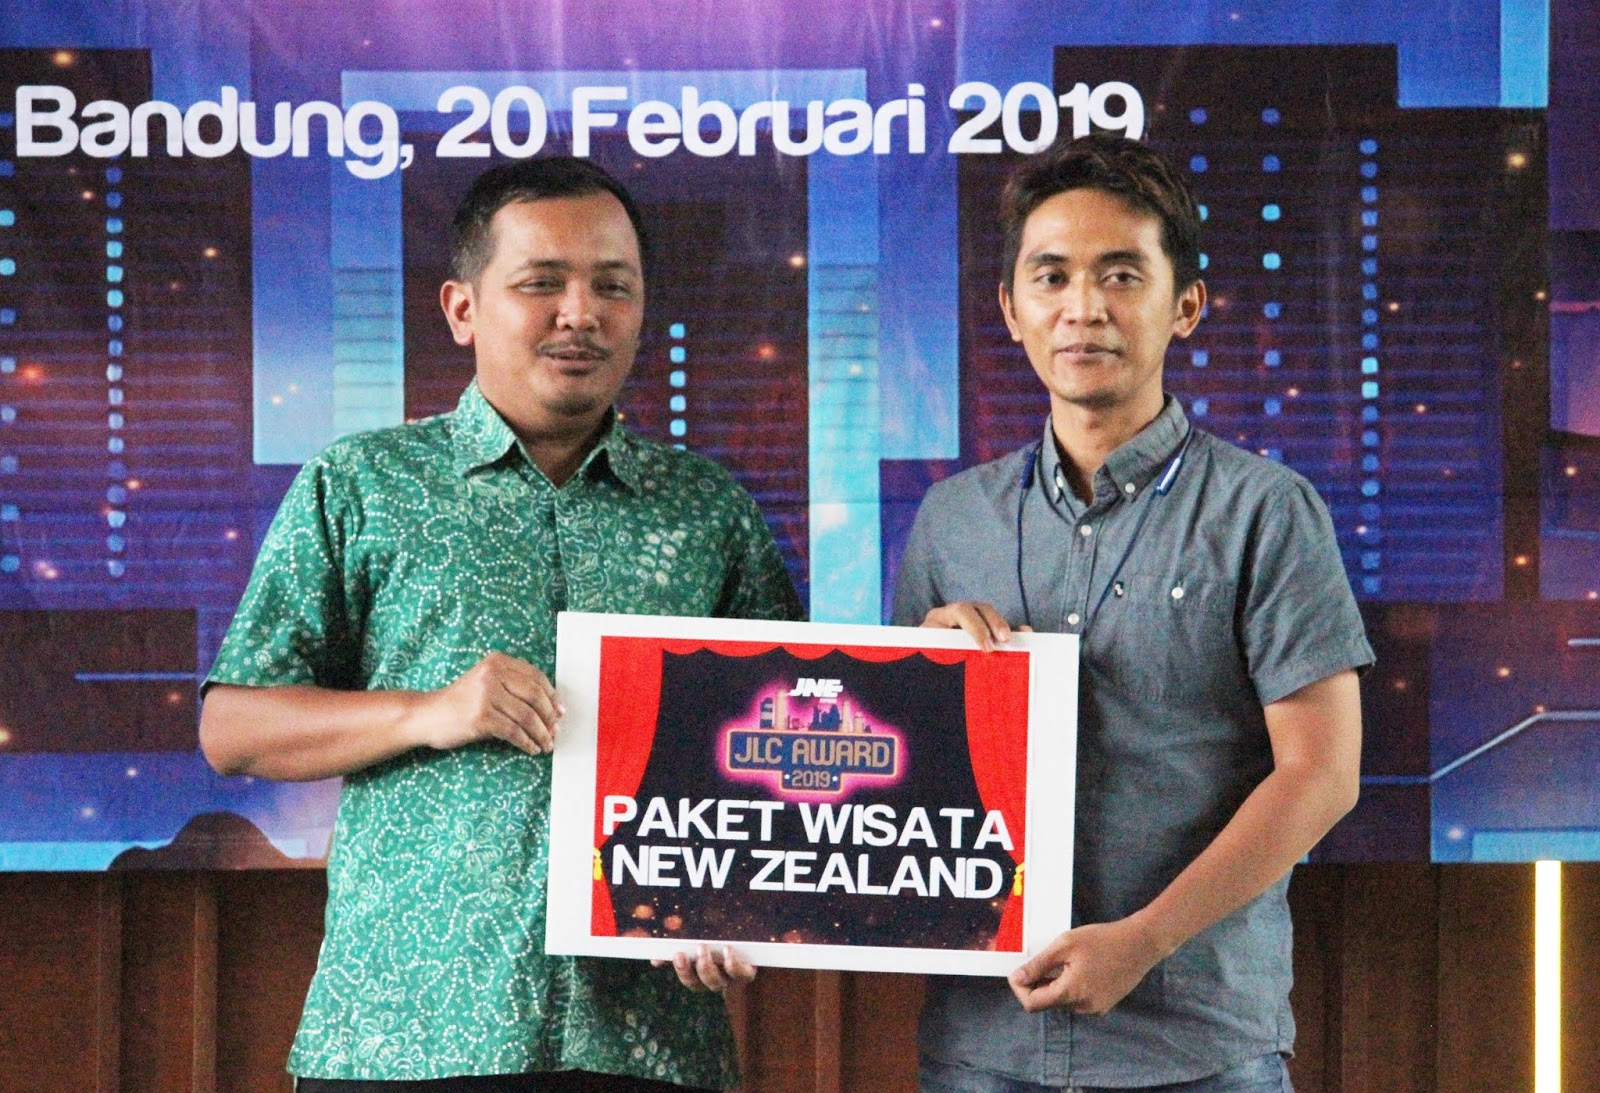 Ceremonial Penyerahan Hadiah JLC Awards 2019 di Bandung